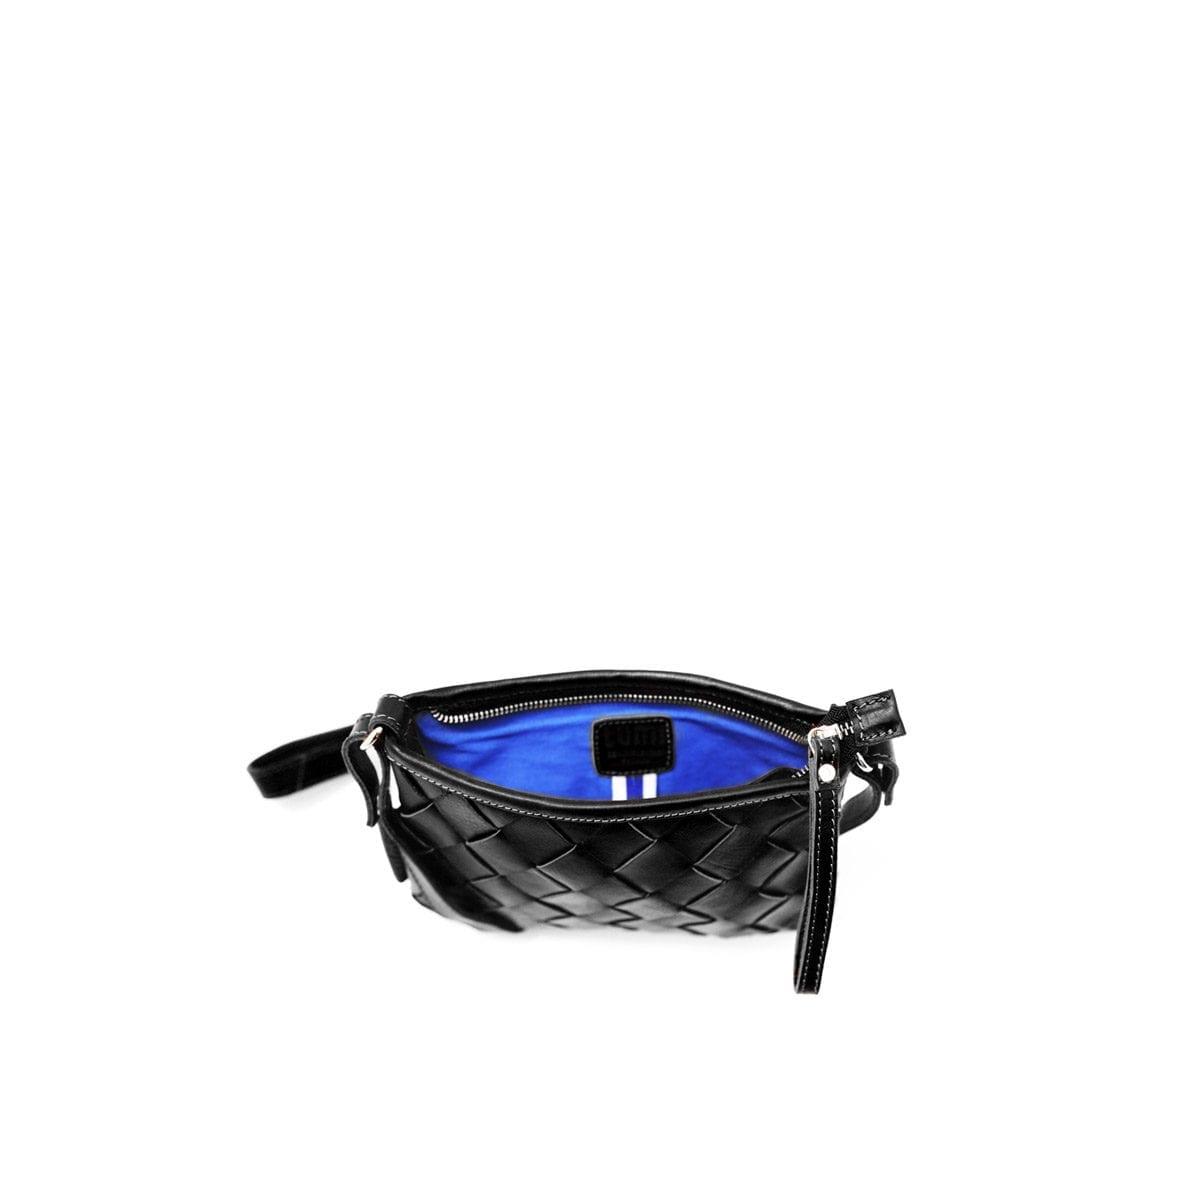 LUMI Toarie Woven Clutch Small, in black